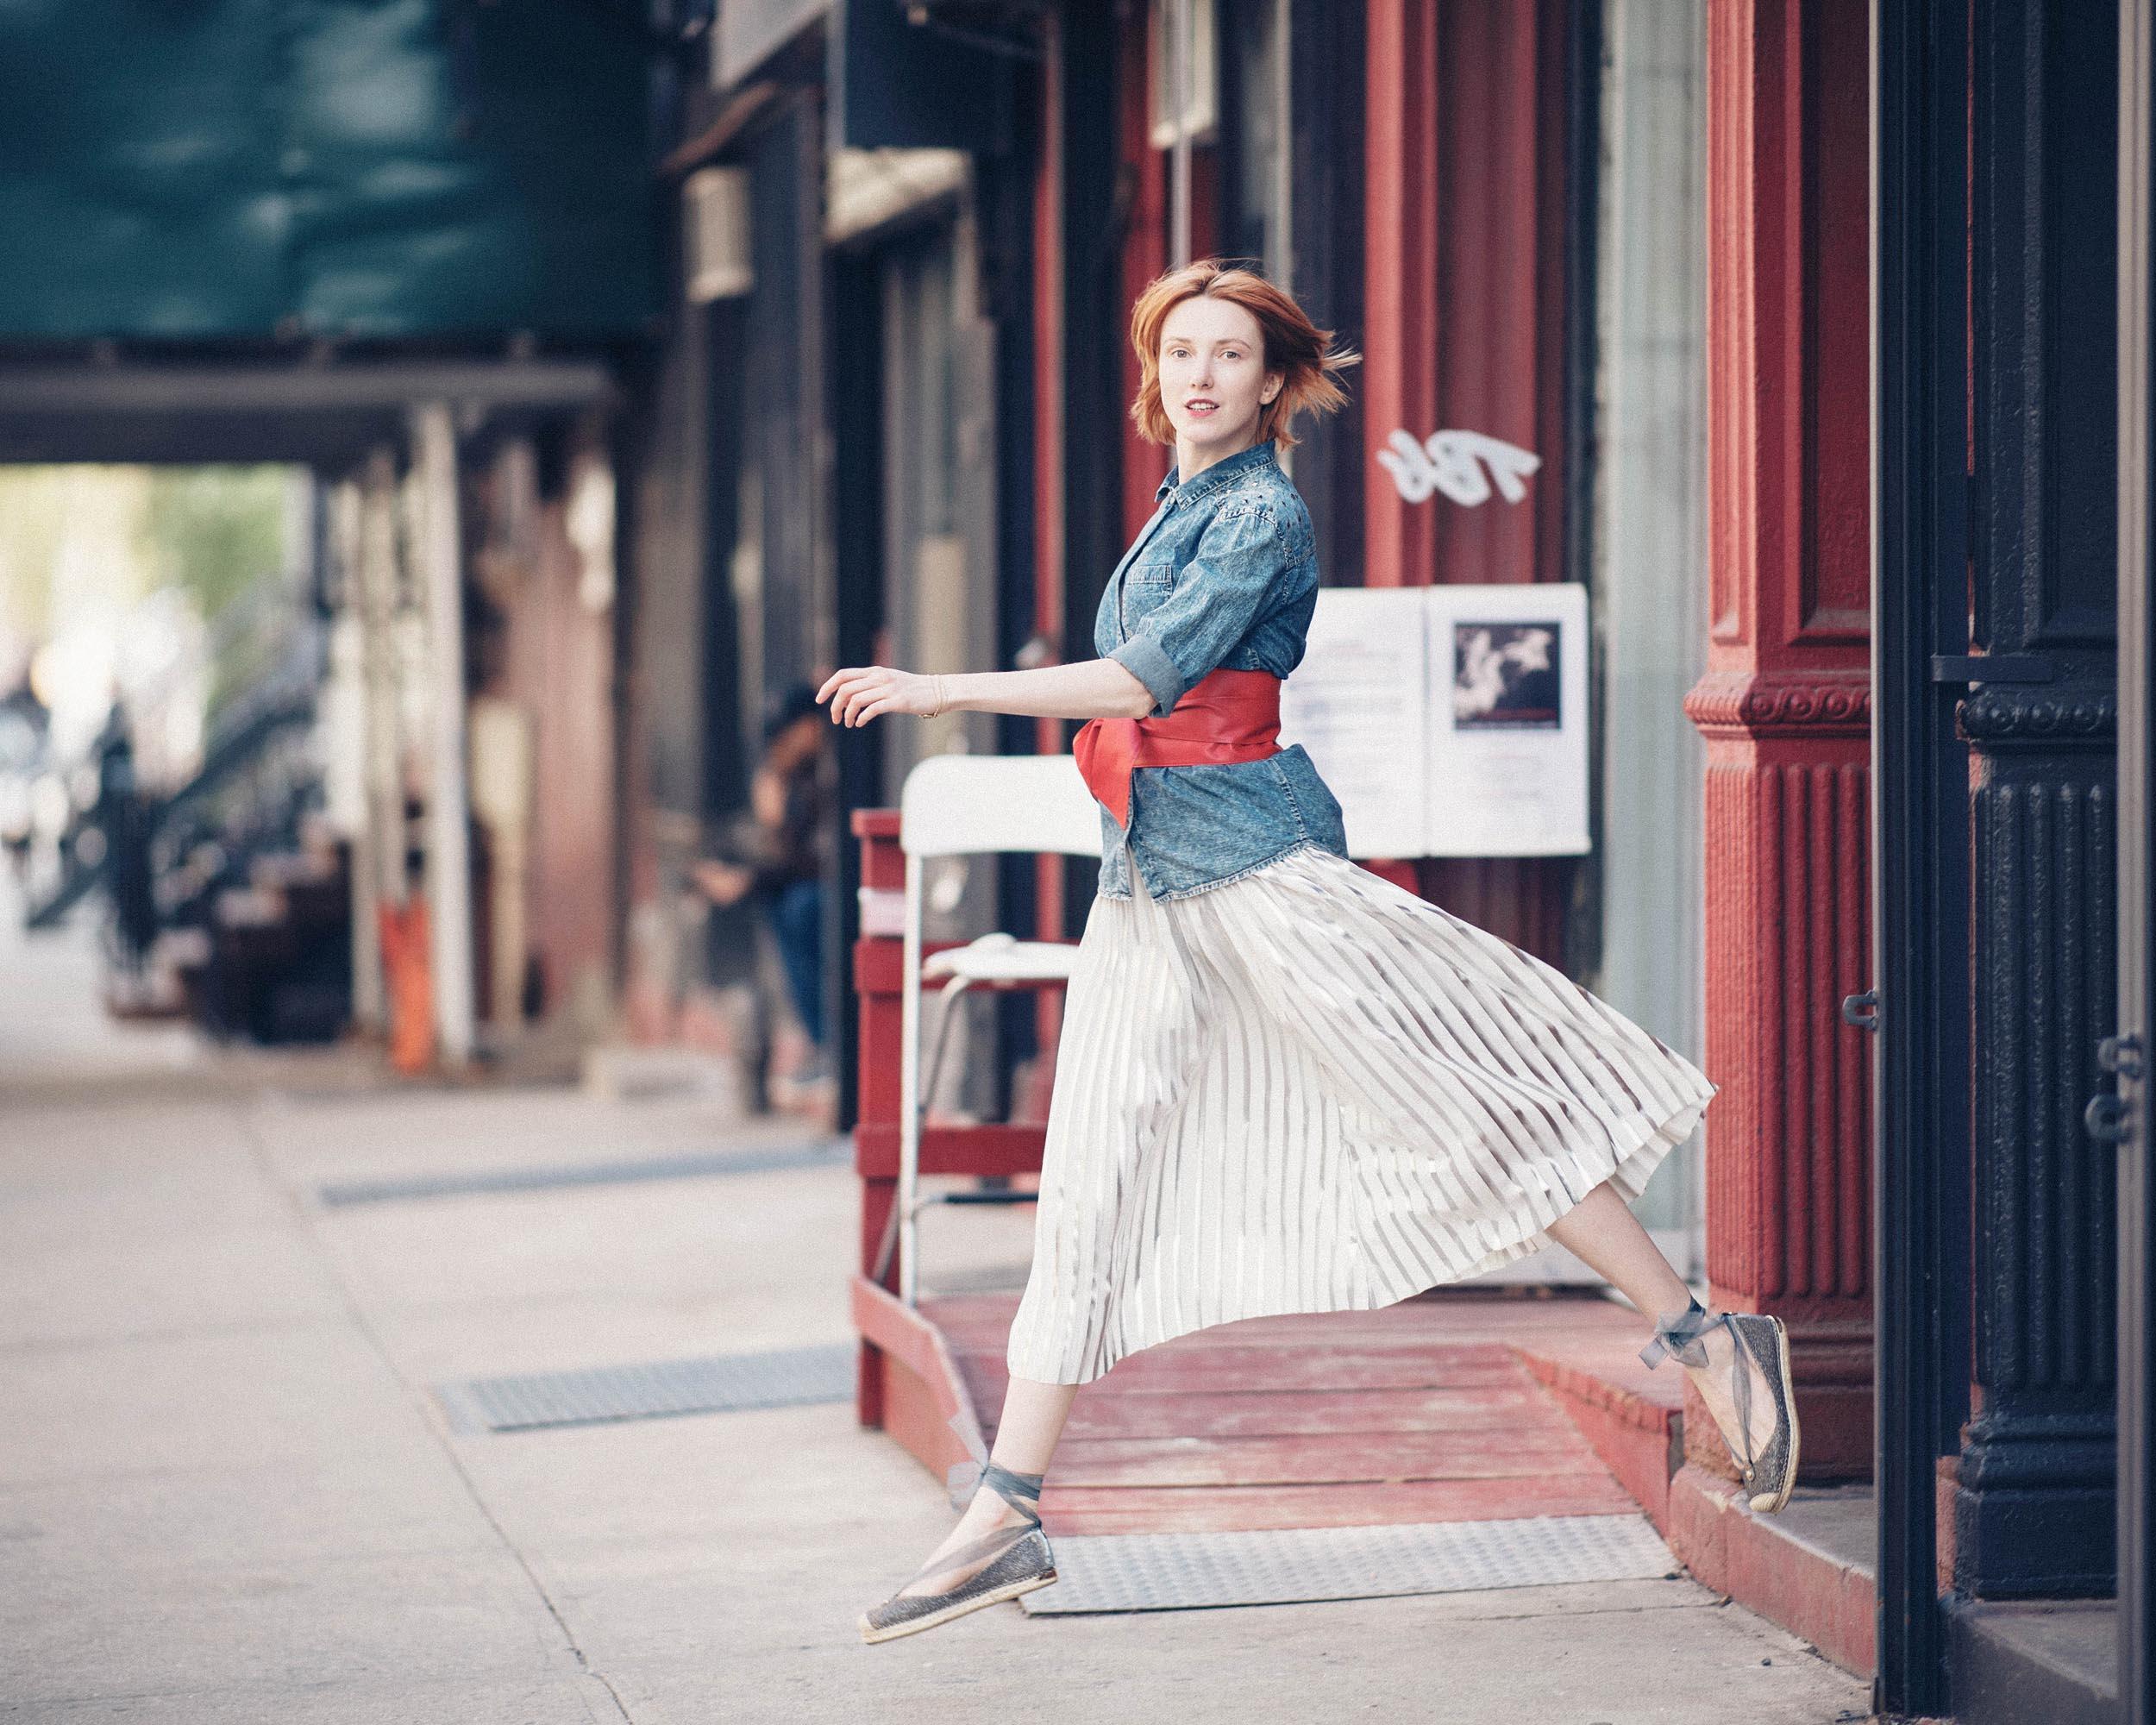 nyc-photographers-NYC-Tour-PHOTOSHOOT-10017.jpg